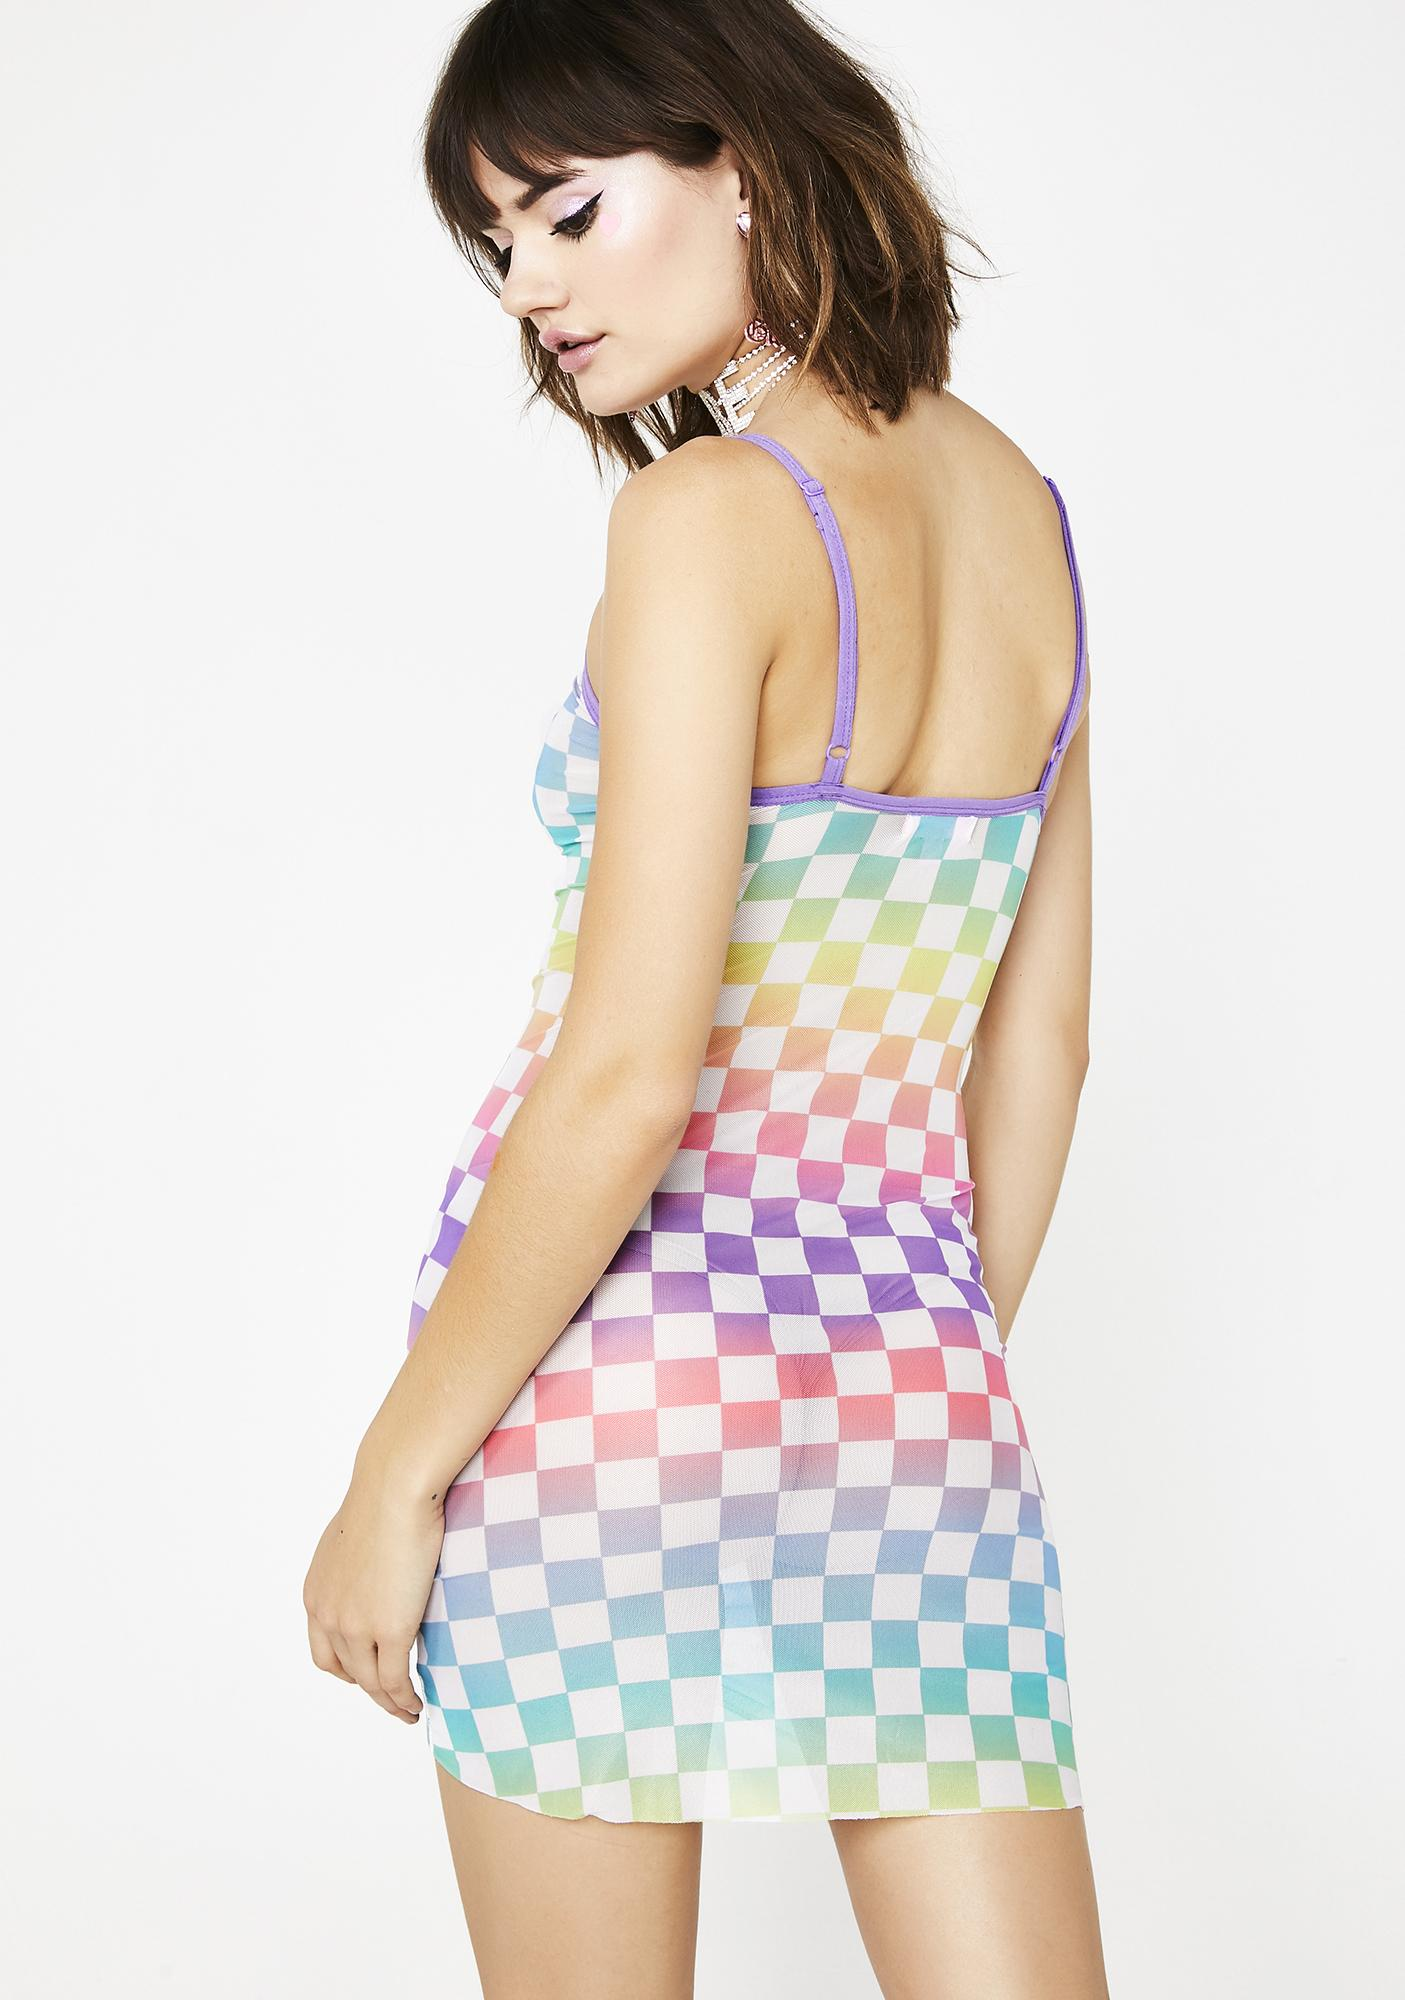 Sugar Thrillz Countin' Checks Sheer Dress